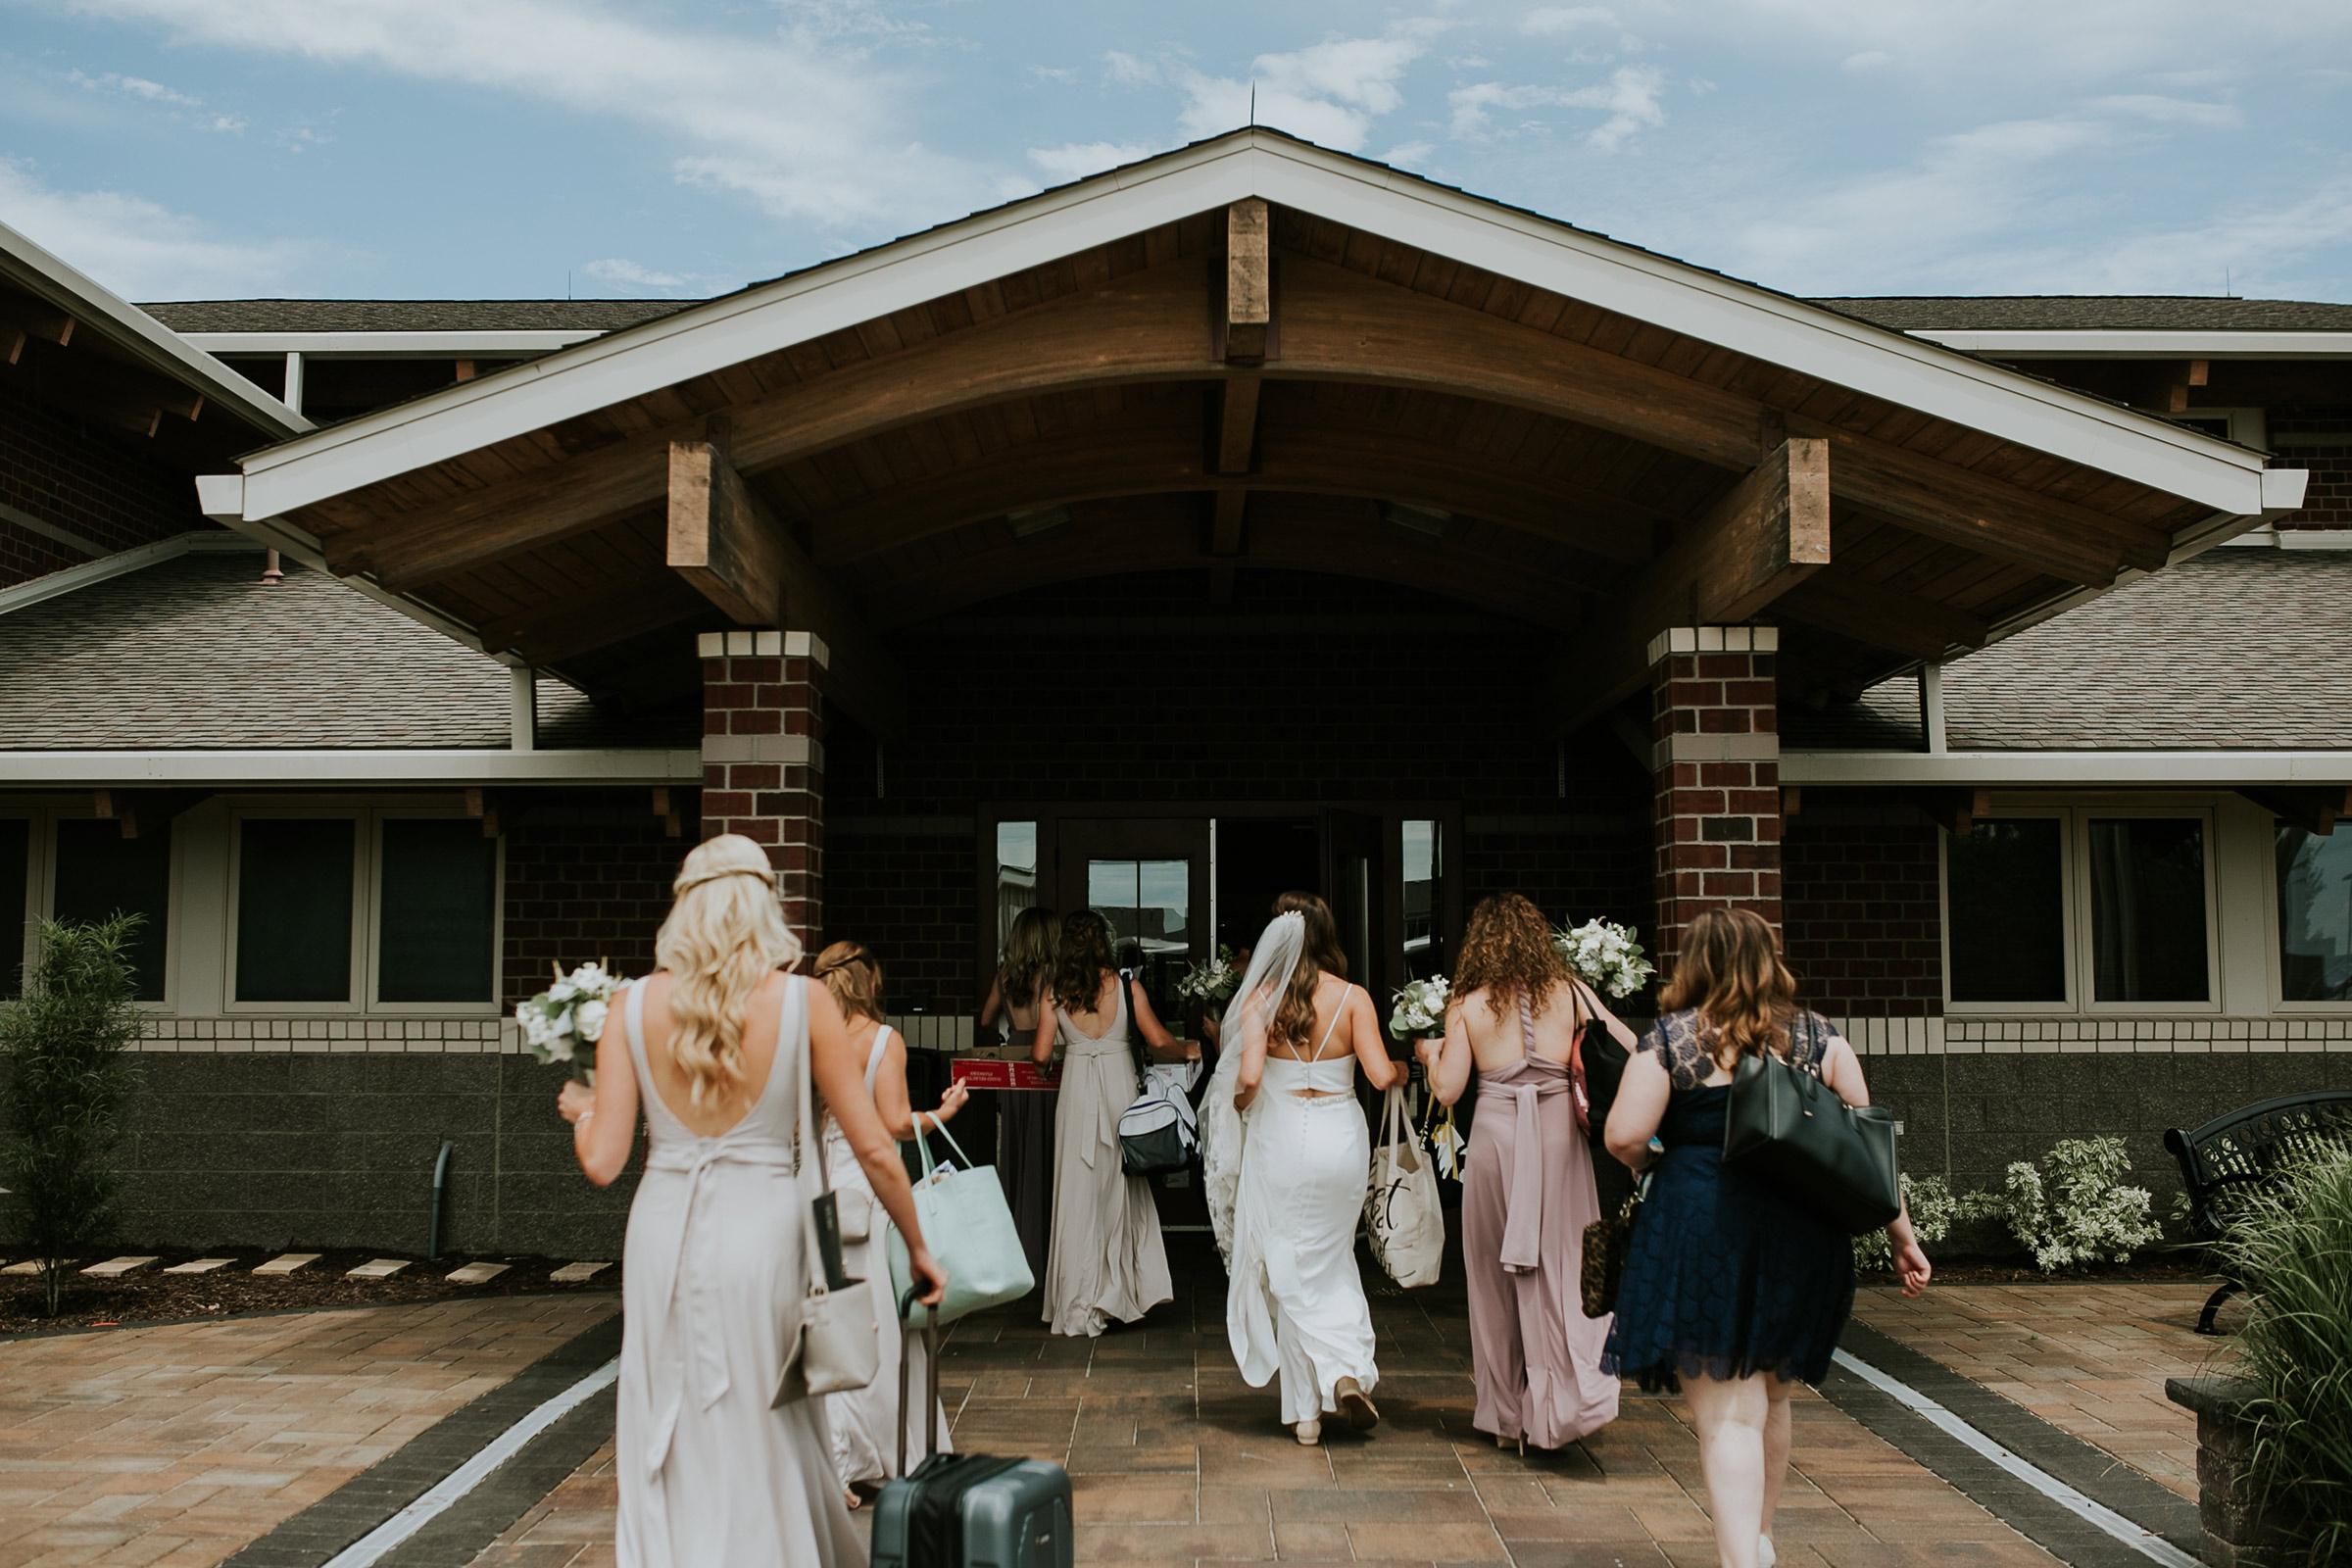 mr-mrs-hull-bride-bridesmaids-walking-into-st-boniface-church-waukee-desmoines-iowa-raelyn-ramey-photography-179.jpg